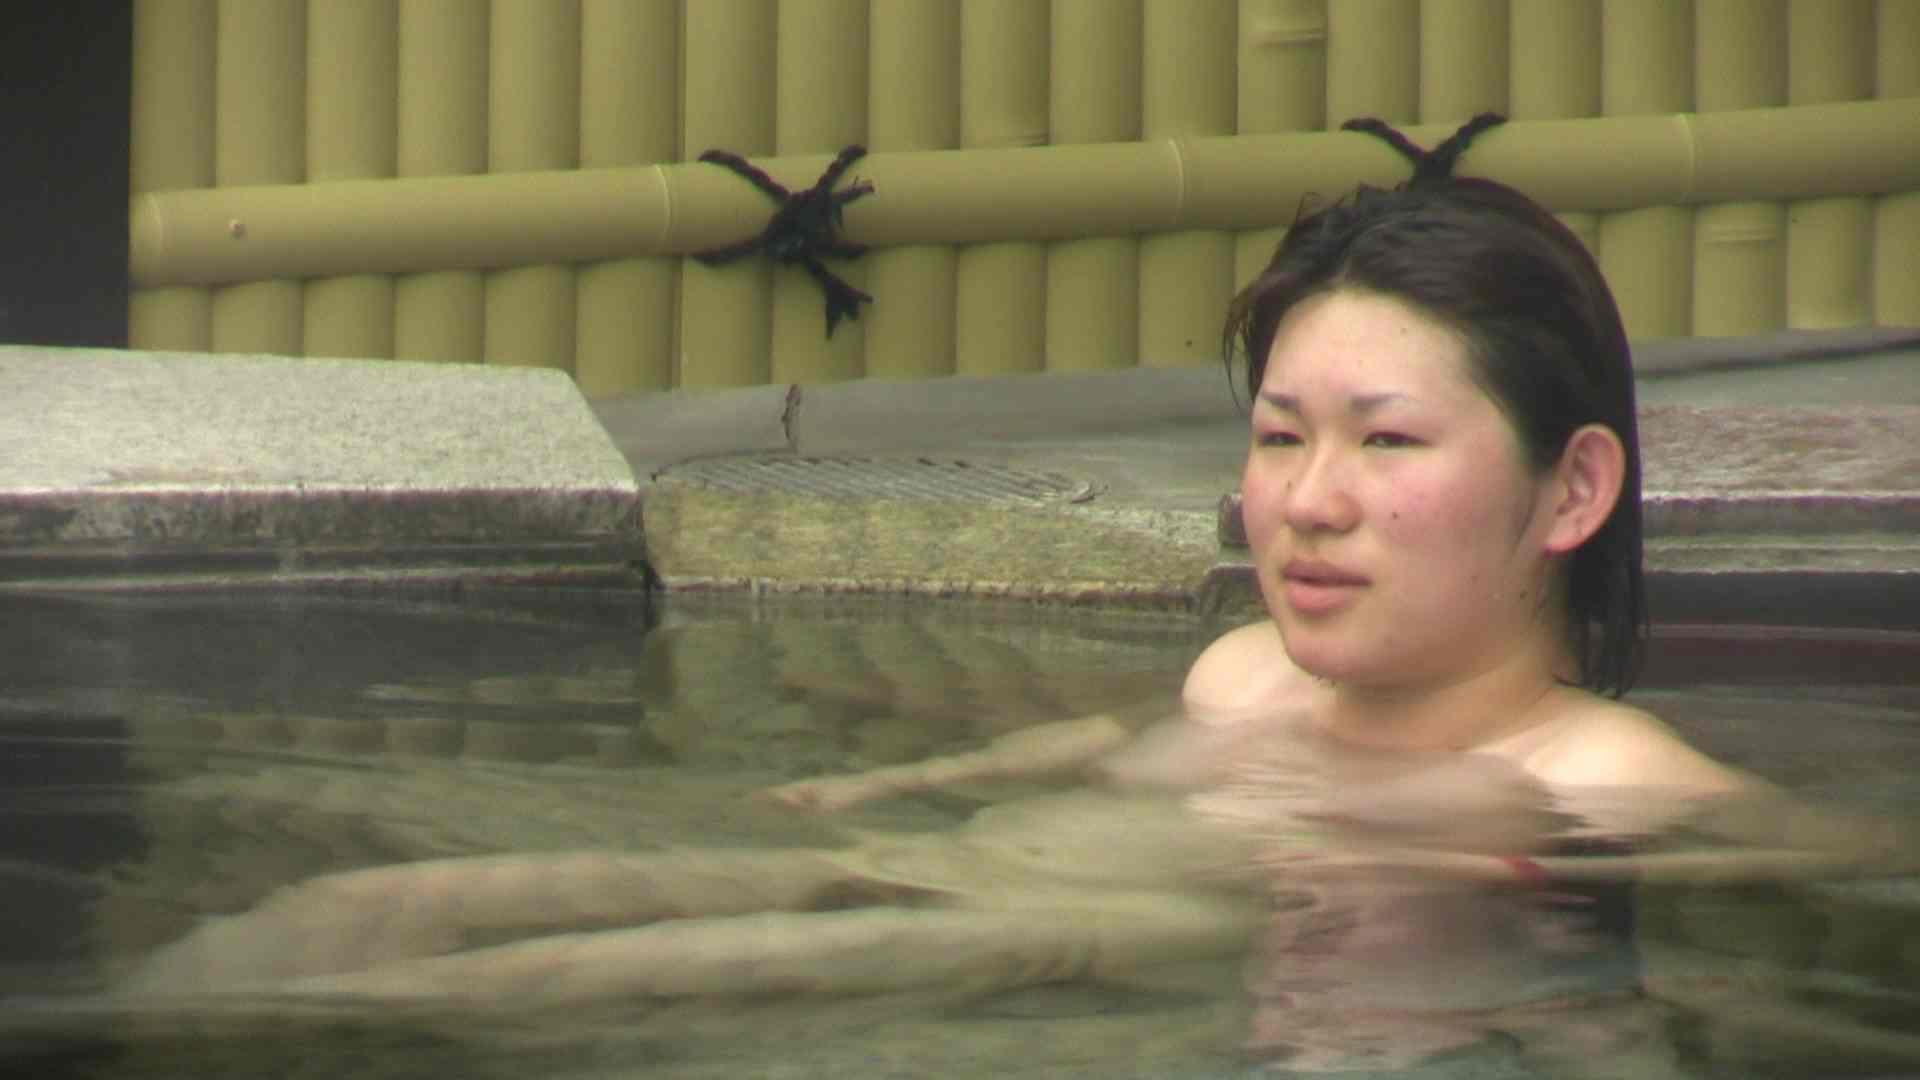 Aquaな露天風呂Vol.673 盗撮 おめこ無修正画像 45連発 35